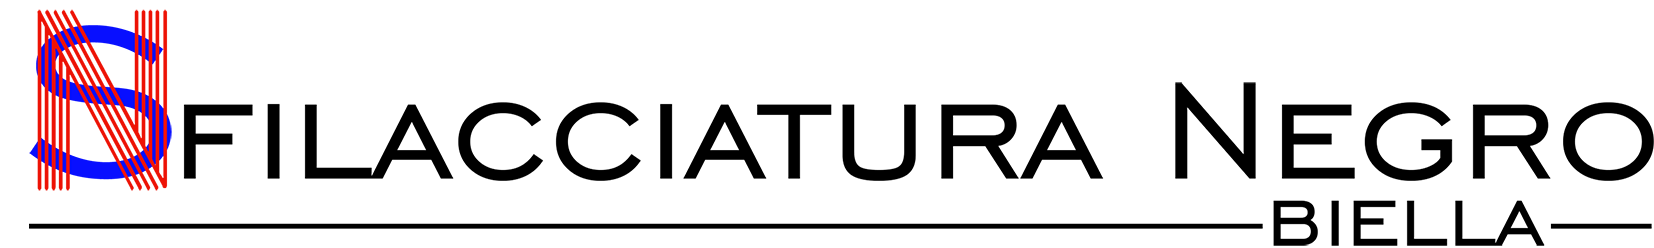 SfilnegroBi